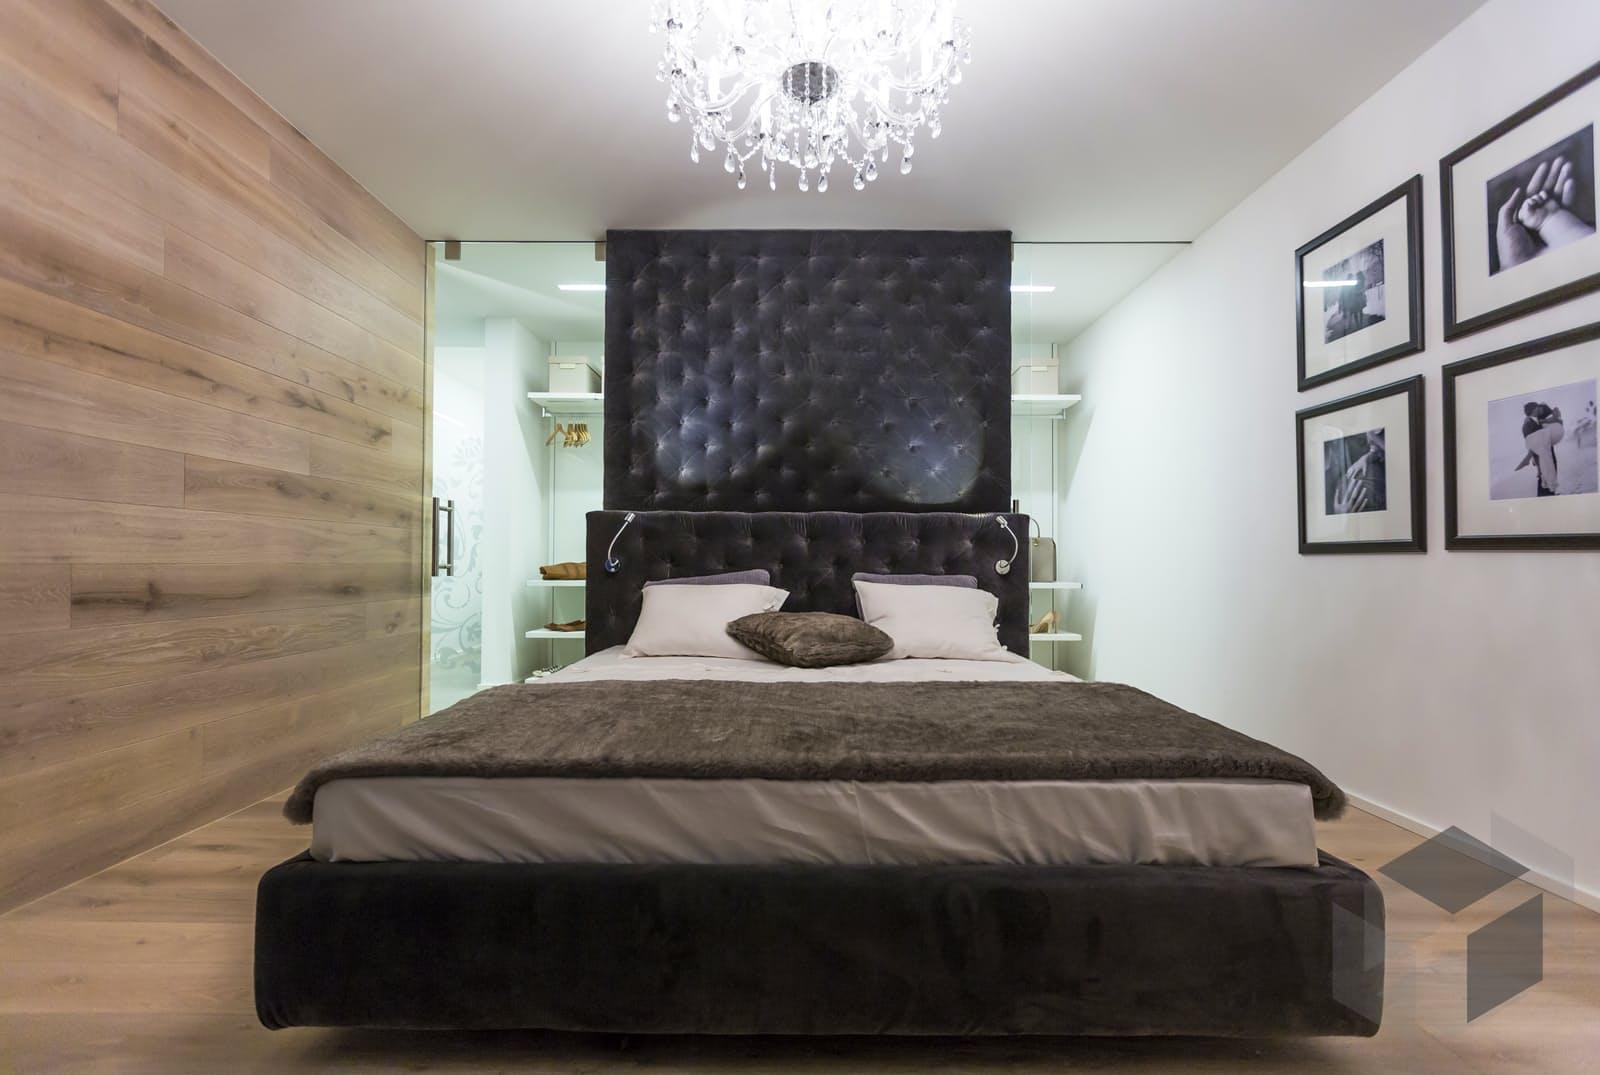 kubus 136 von die hausmanufaktur komplette. Black Bedroom Furniture Sets. Home Design Ideas